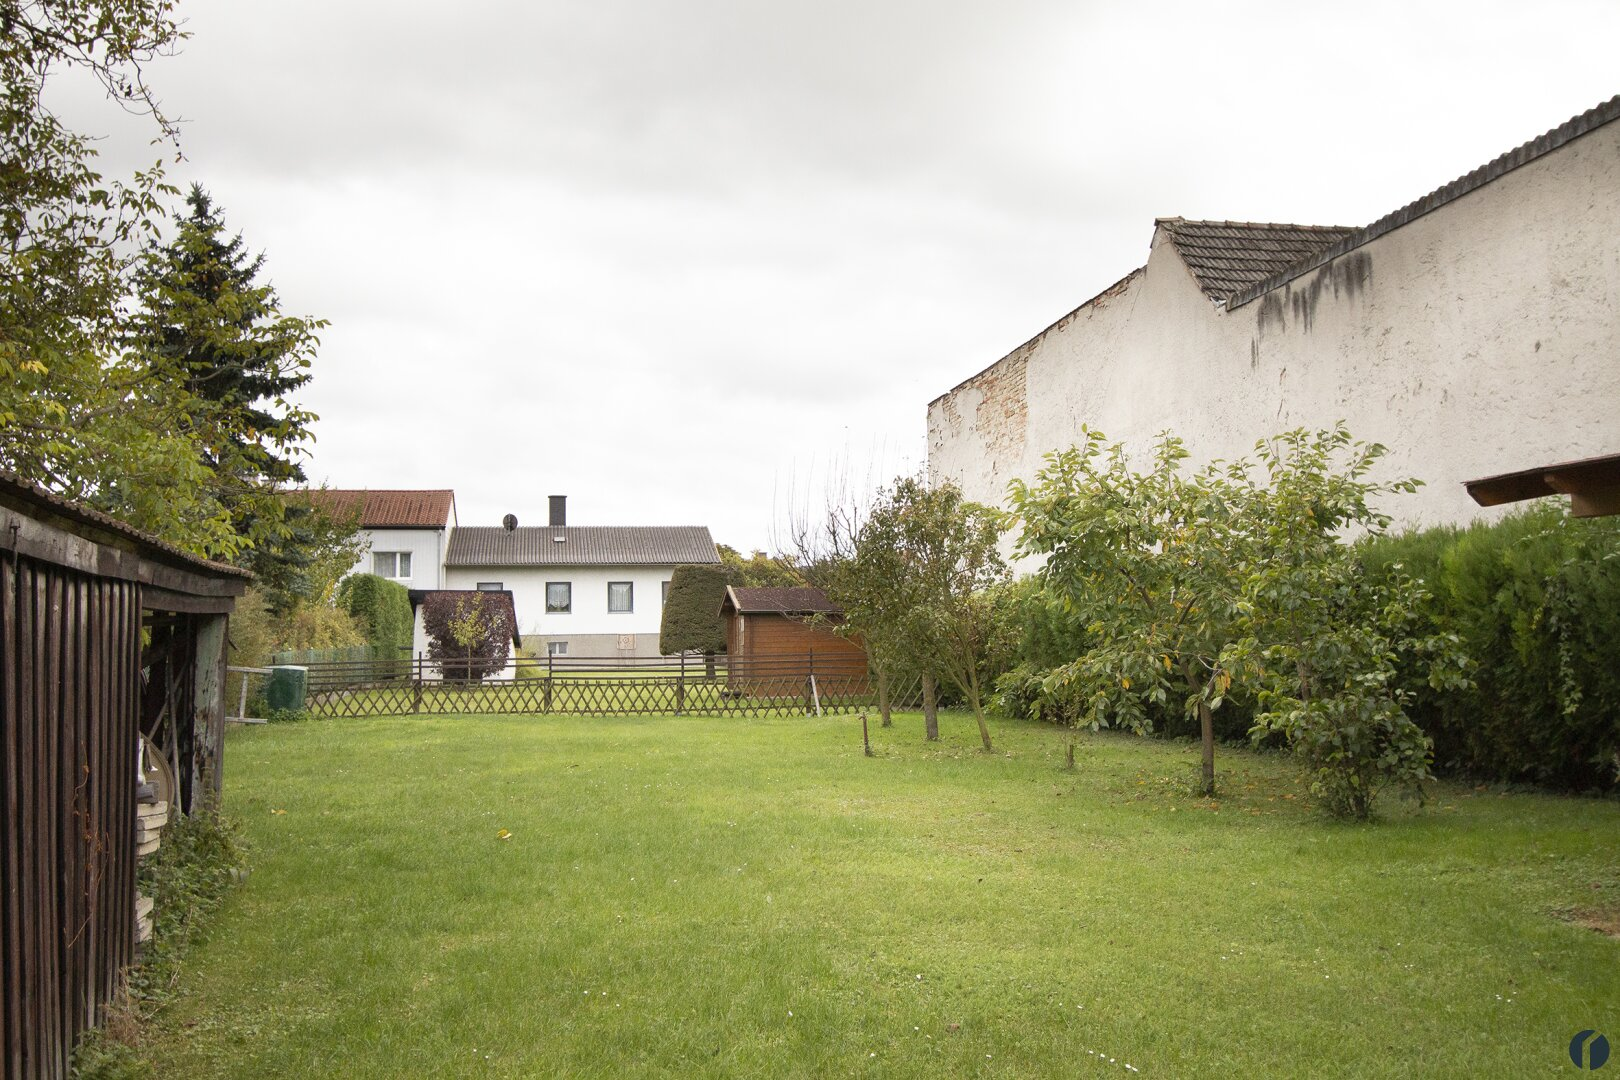 der Garten hinter dem Haus